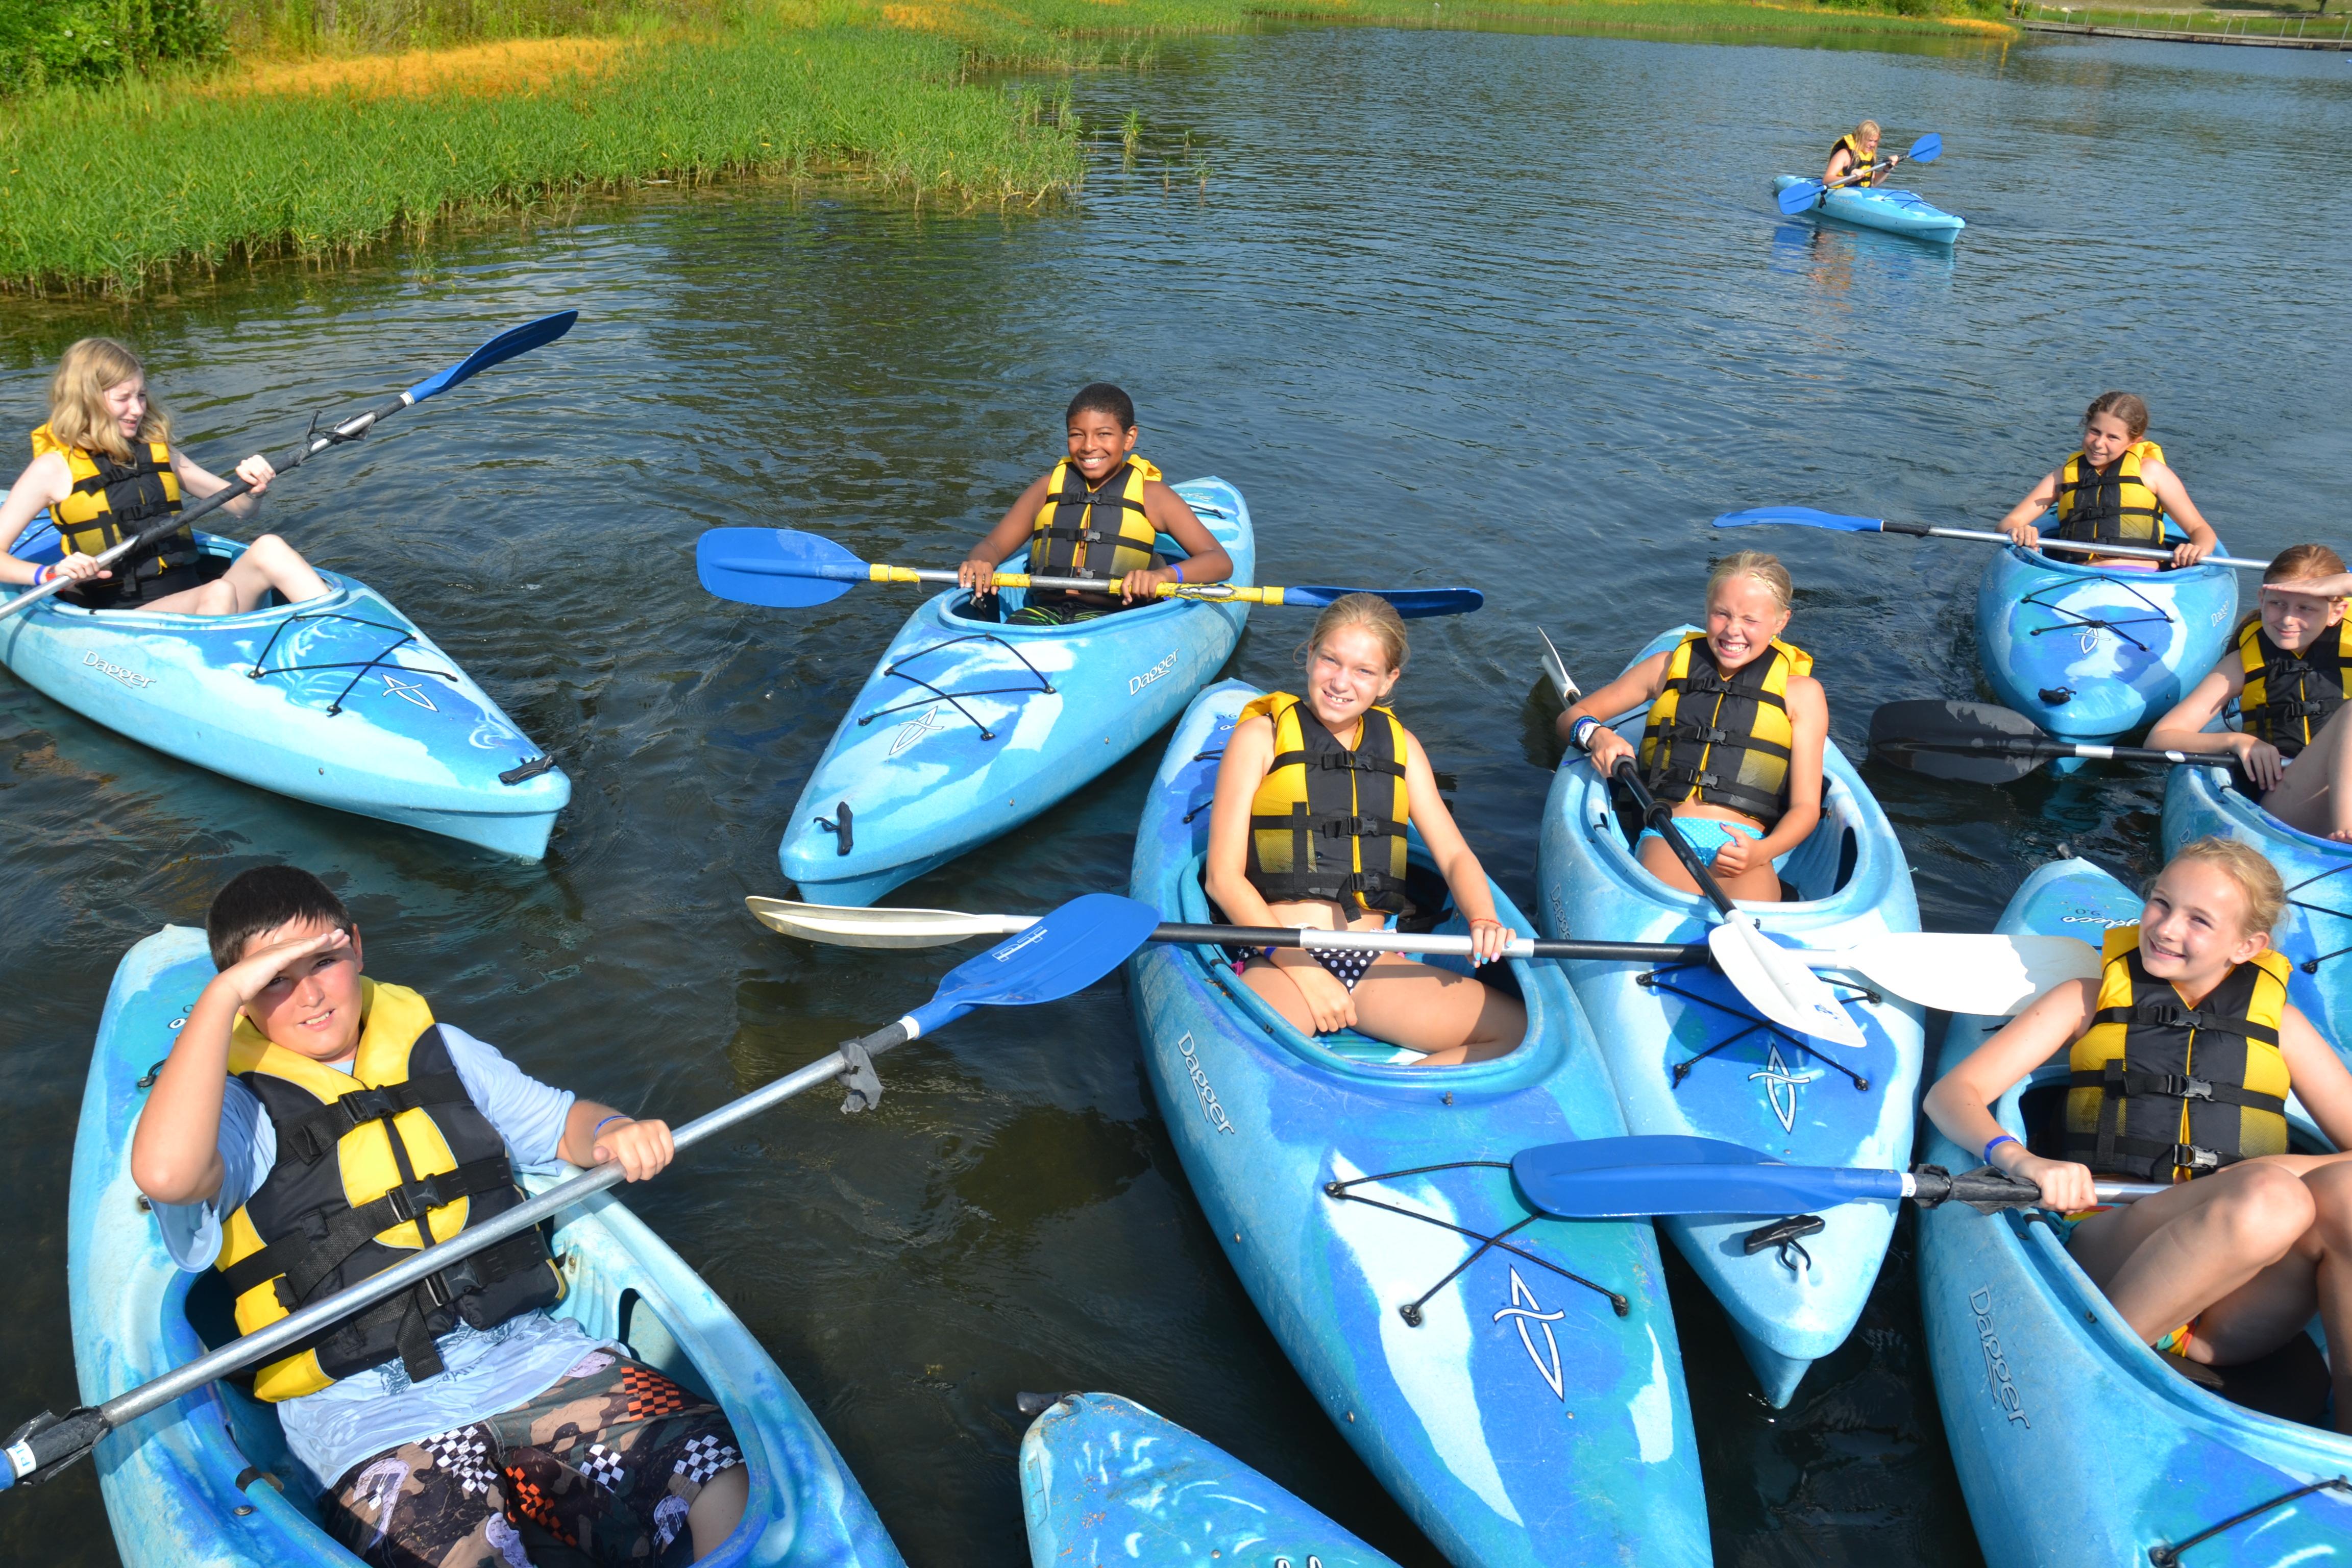 Summer Program - Canoeing | YMCA Camp Lakewood - Overnight Summer Programs